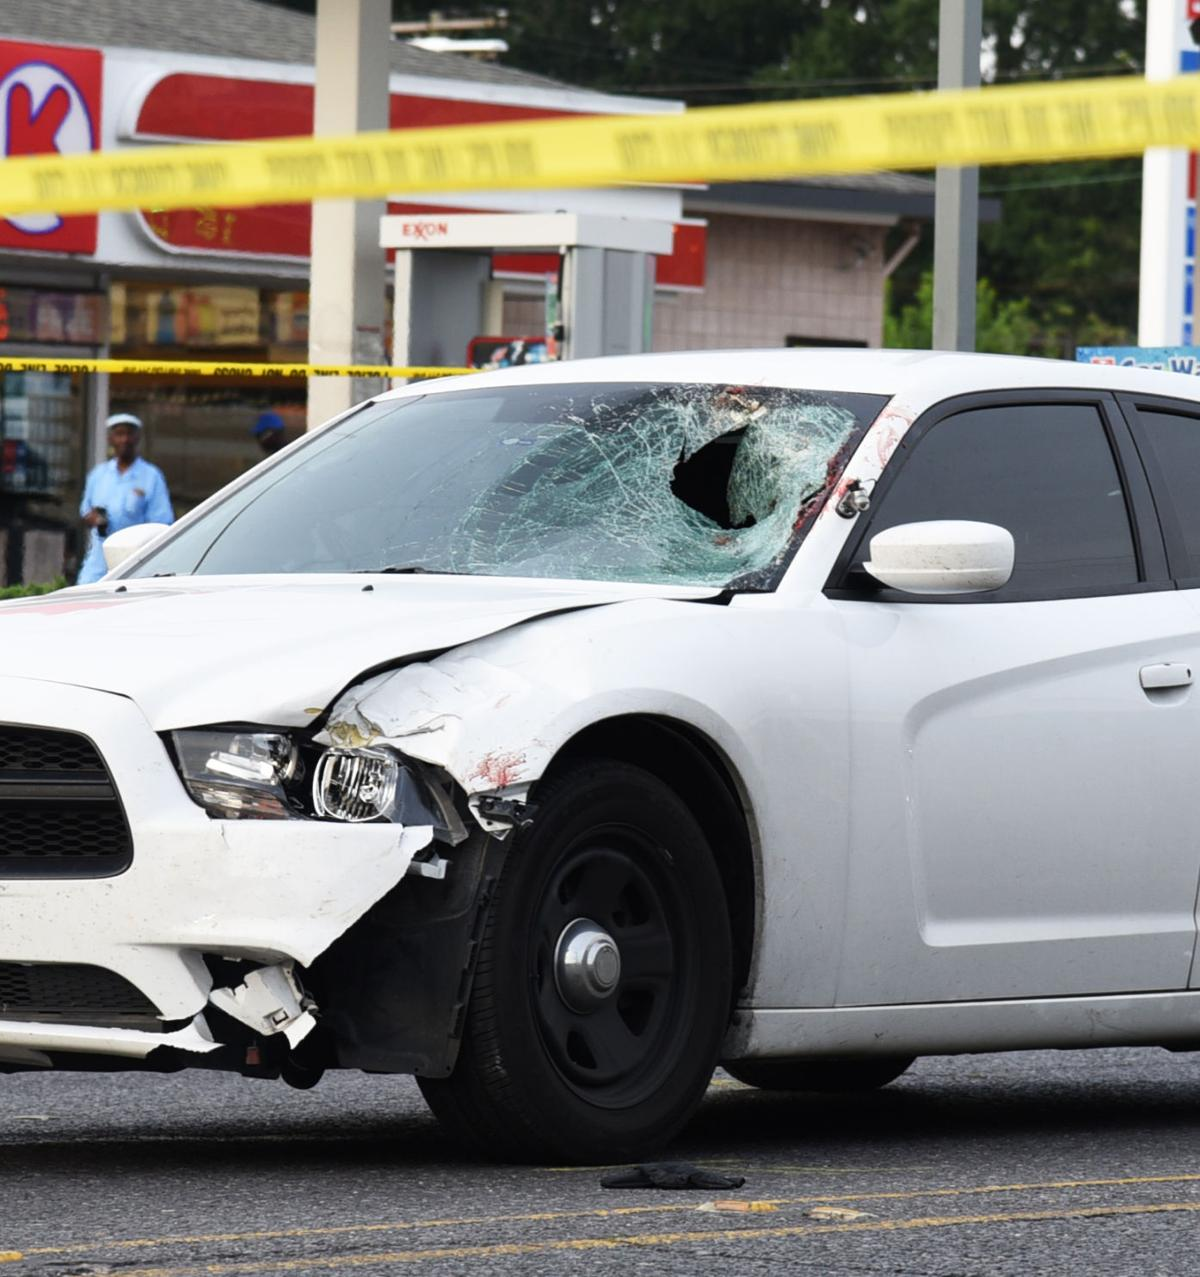 Unmarked Baton Rouge police car strikes, kills pedestrian on